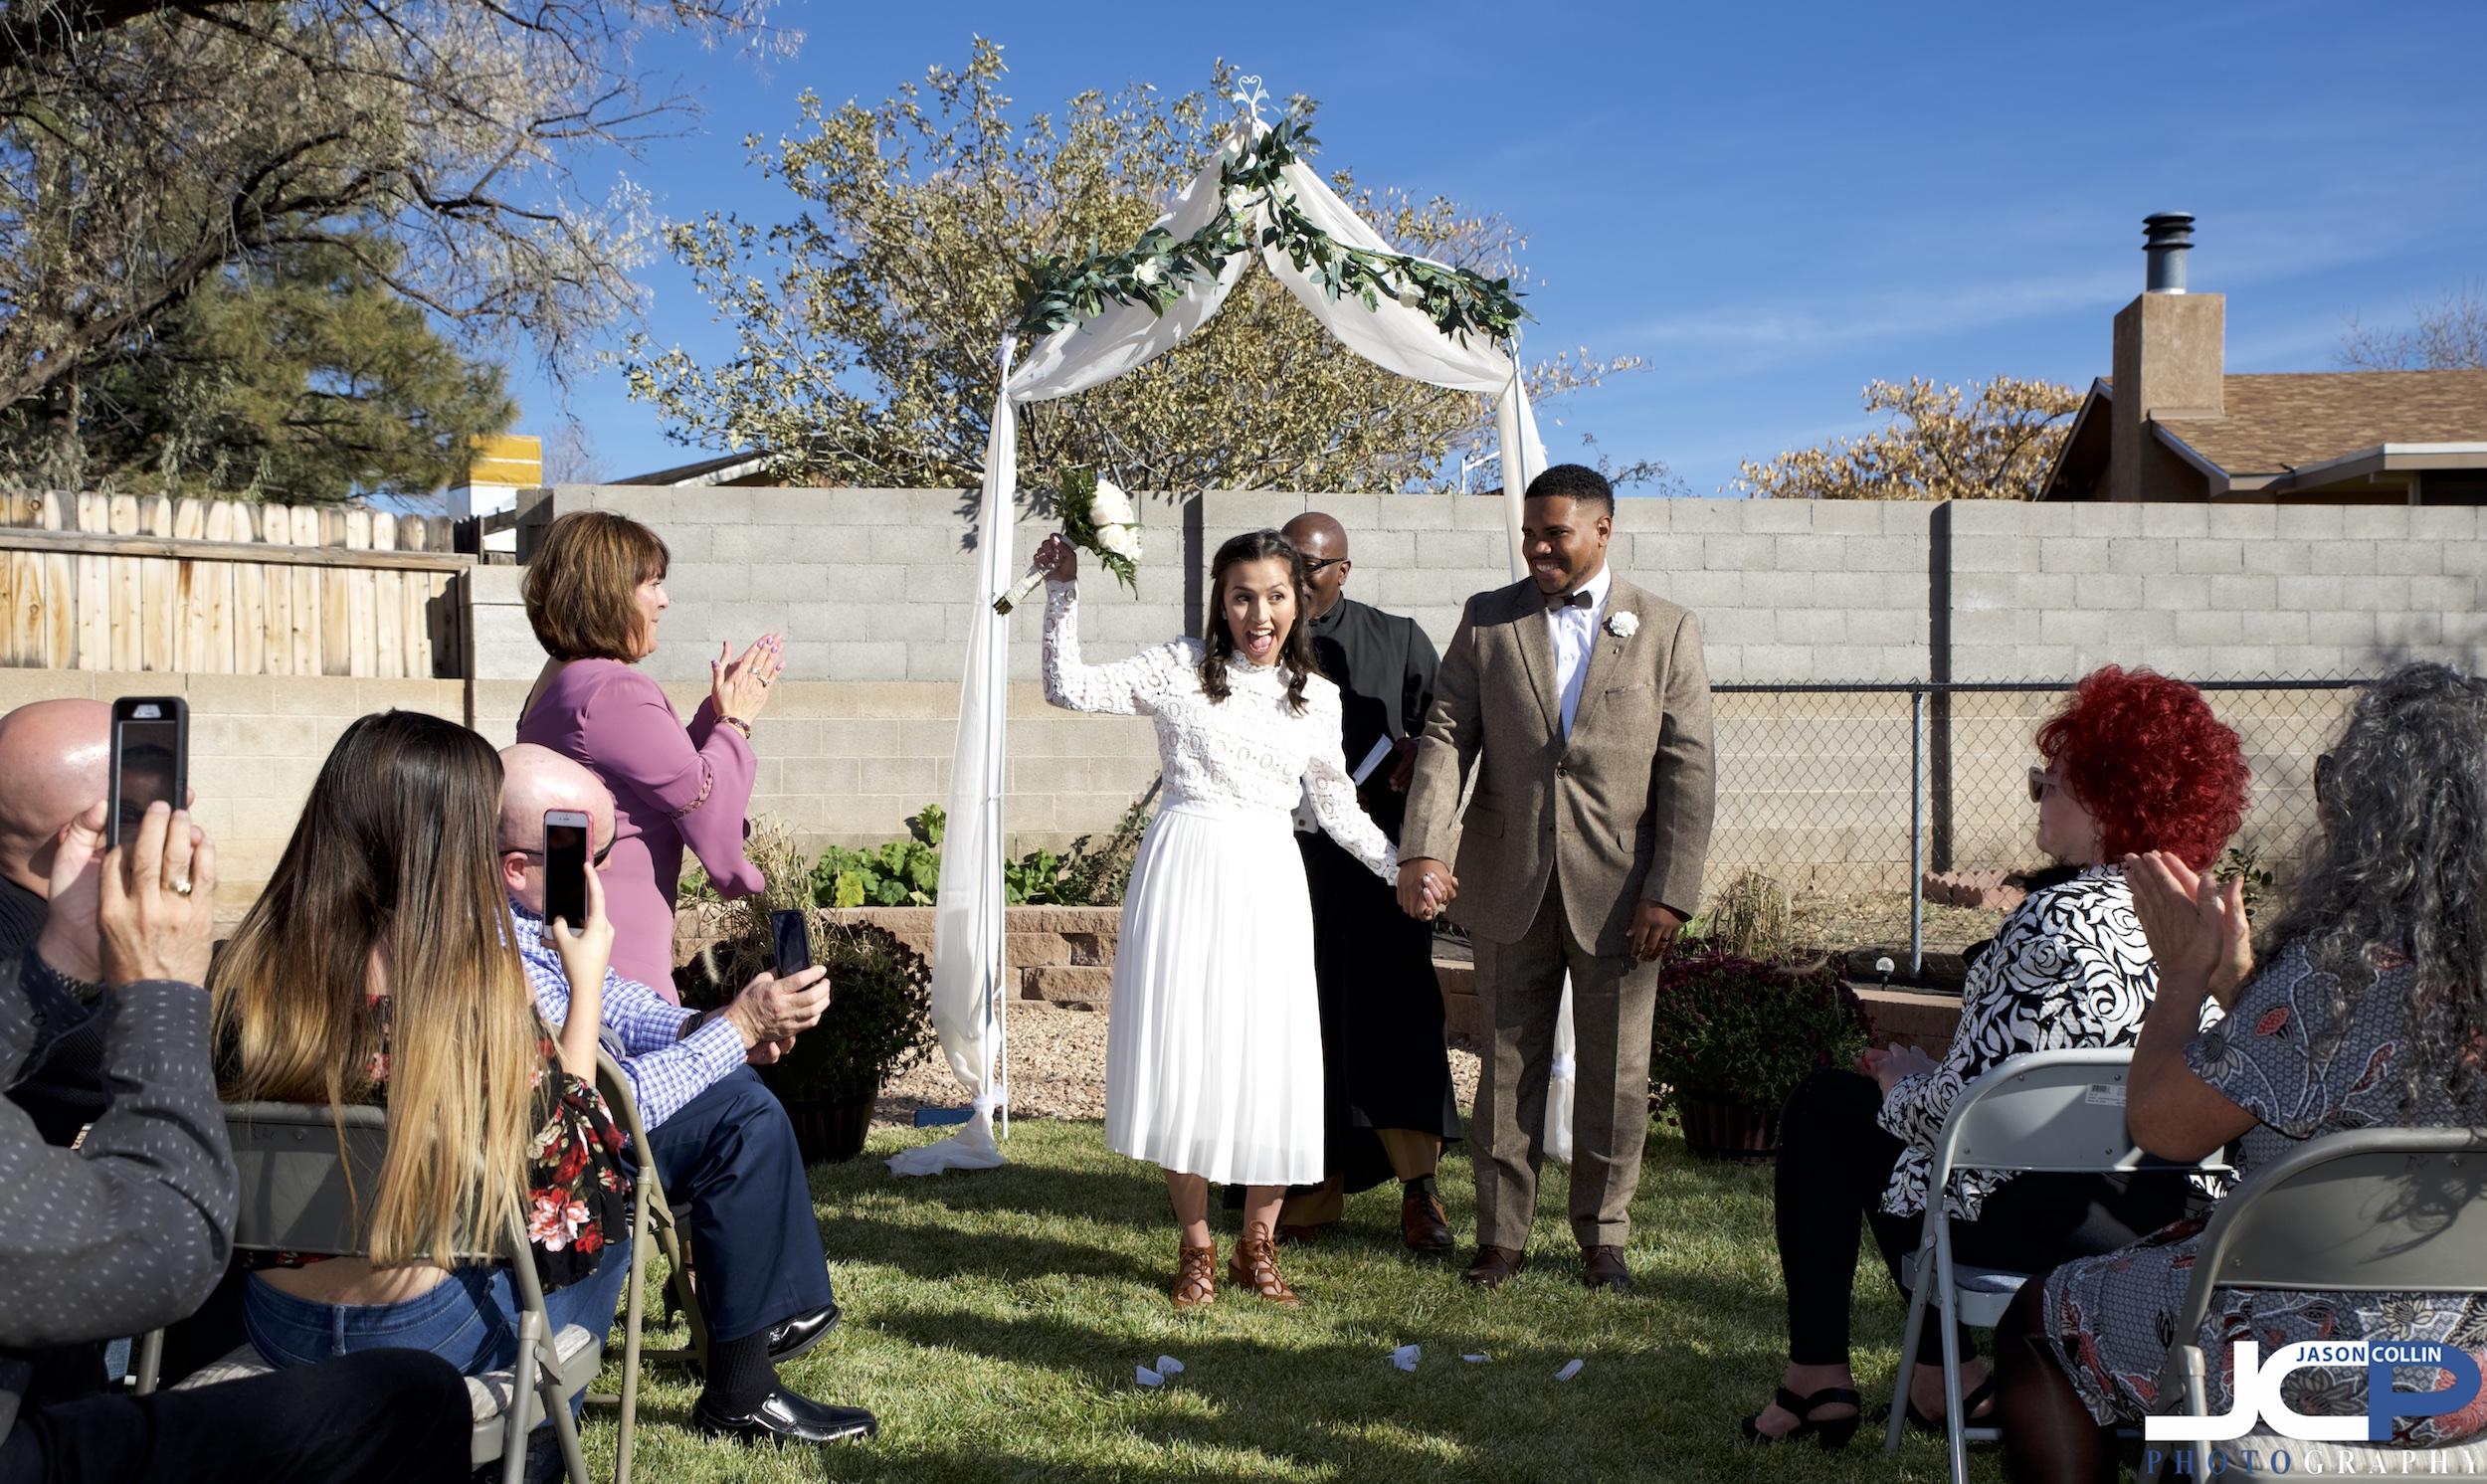 ac-11-17-2018-wedding-113324.jpg